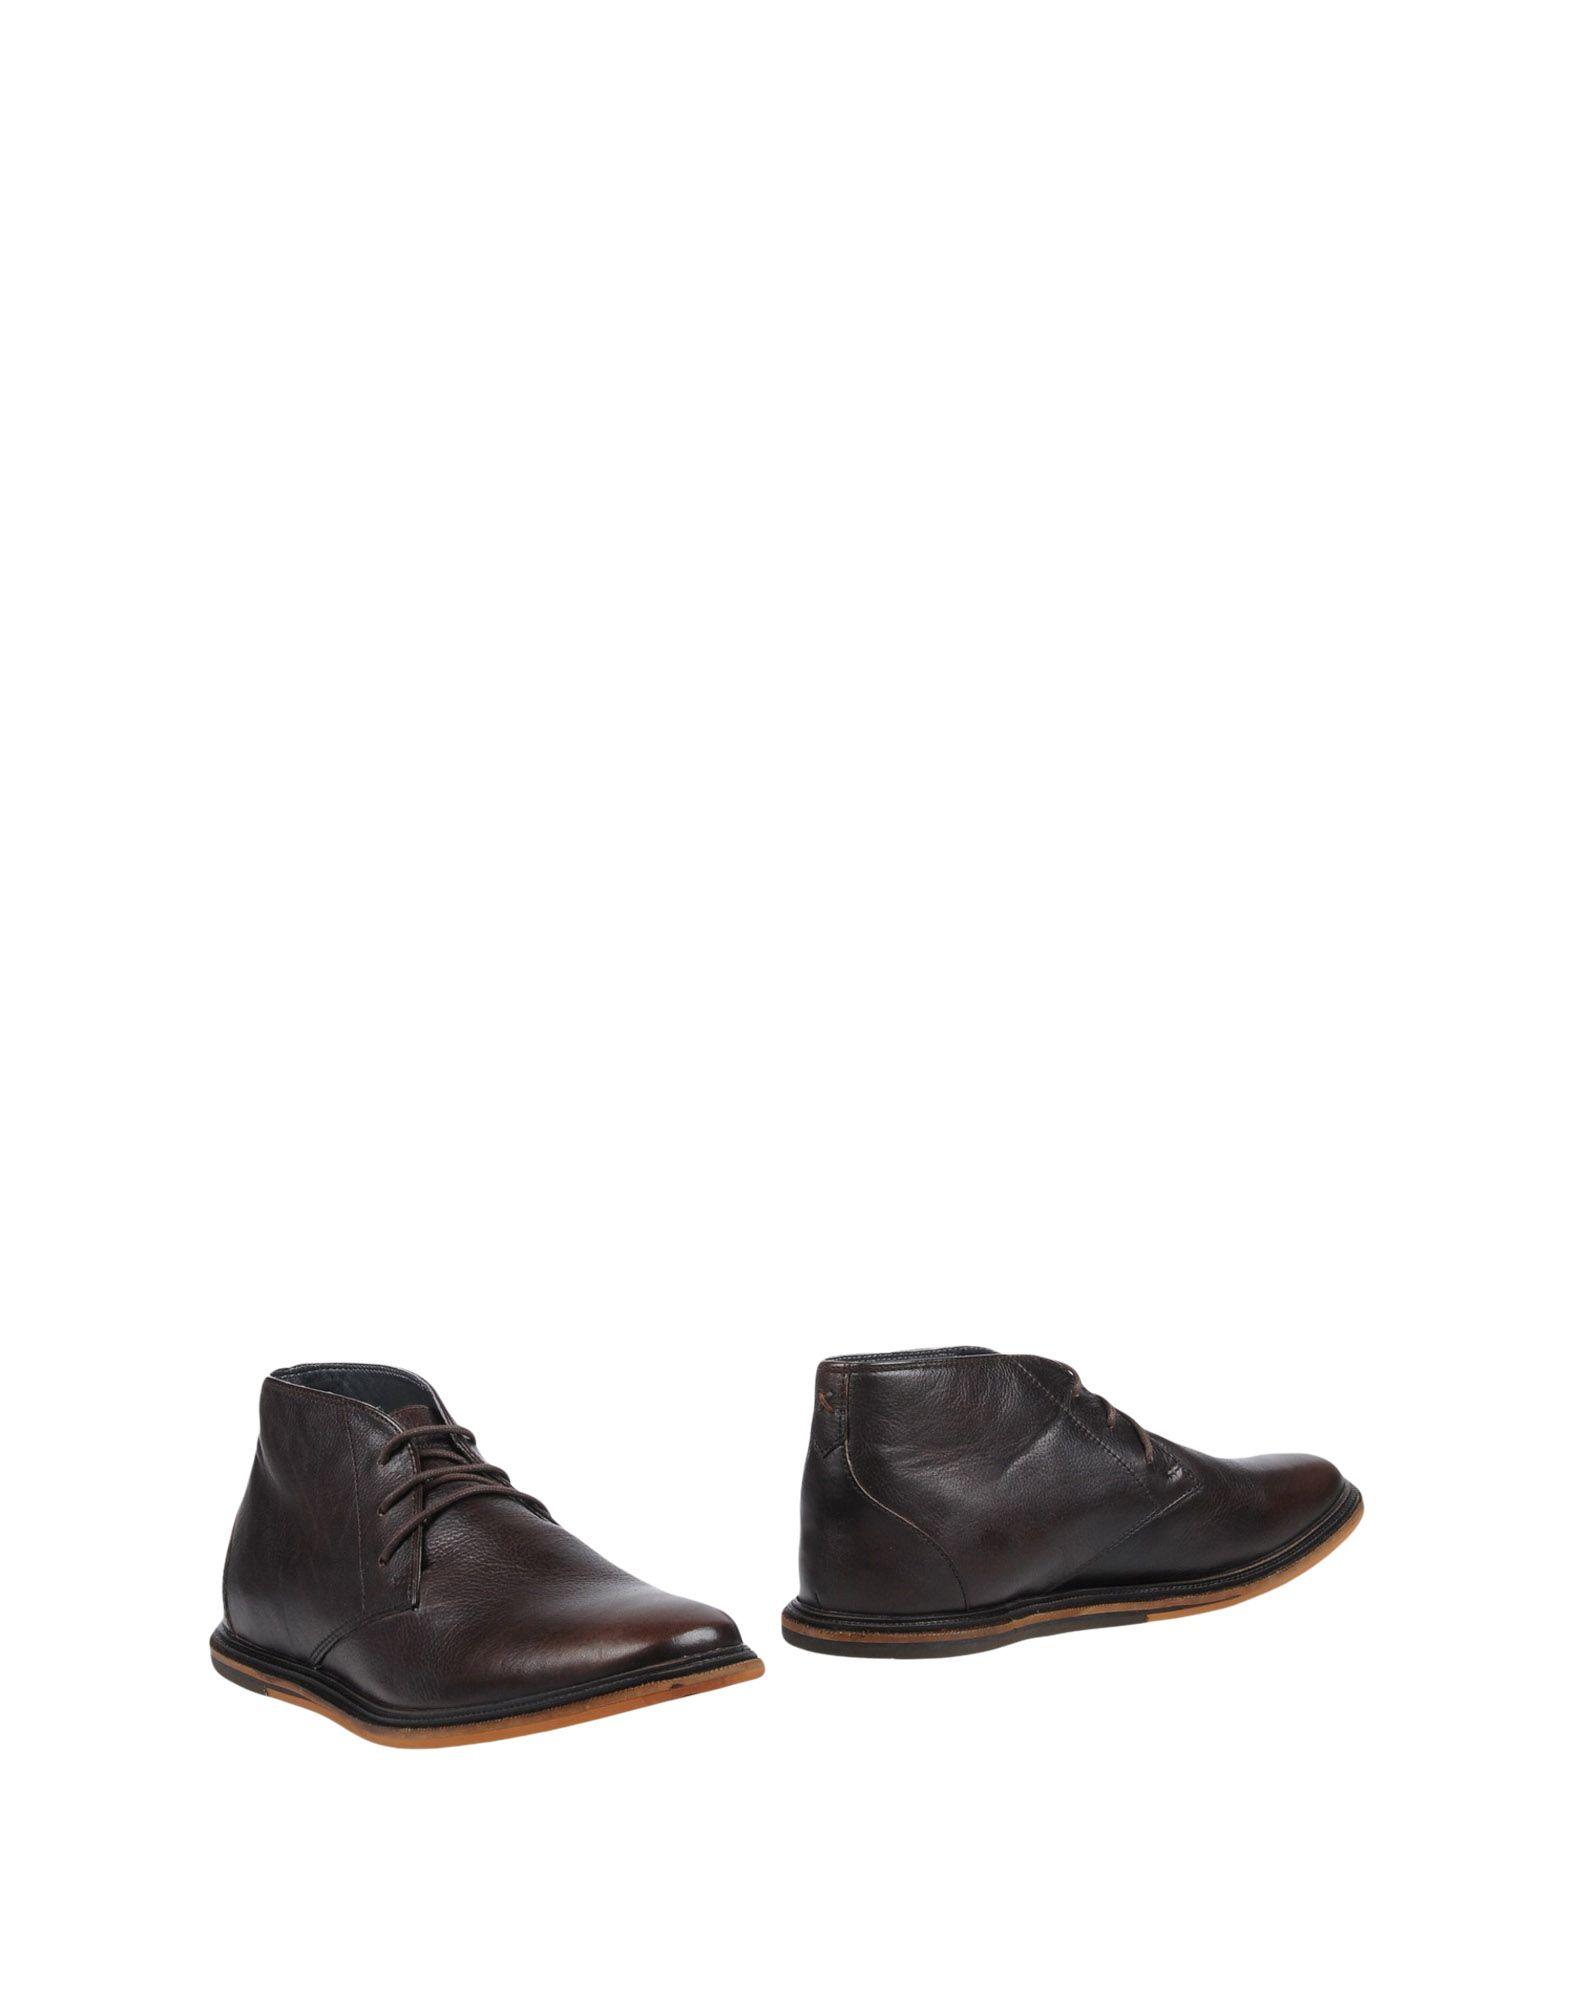 FRANK WRIGHT Полусапоги и высокие ботинки туфли frank wright frank wright fr621amlee37